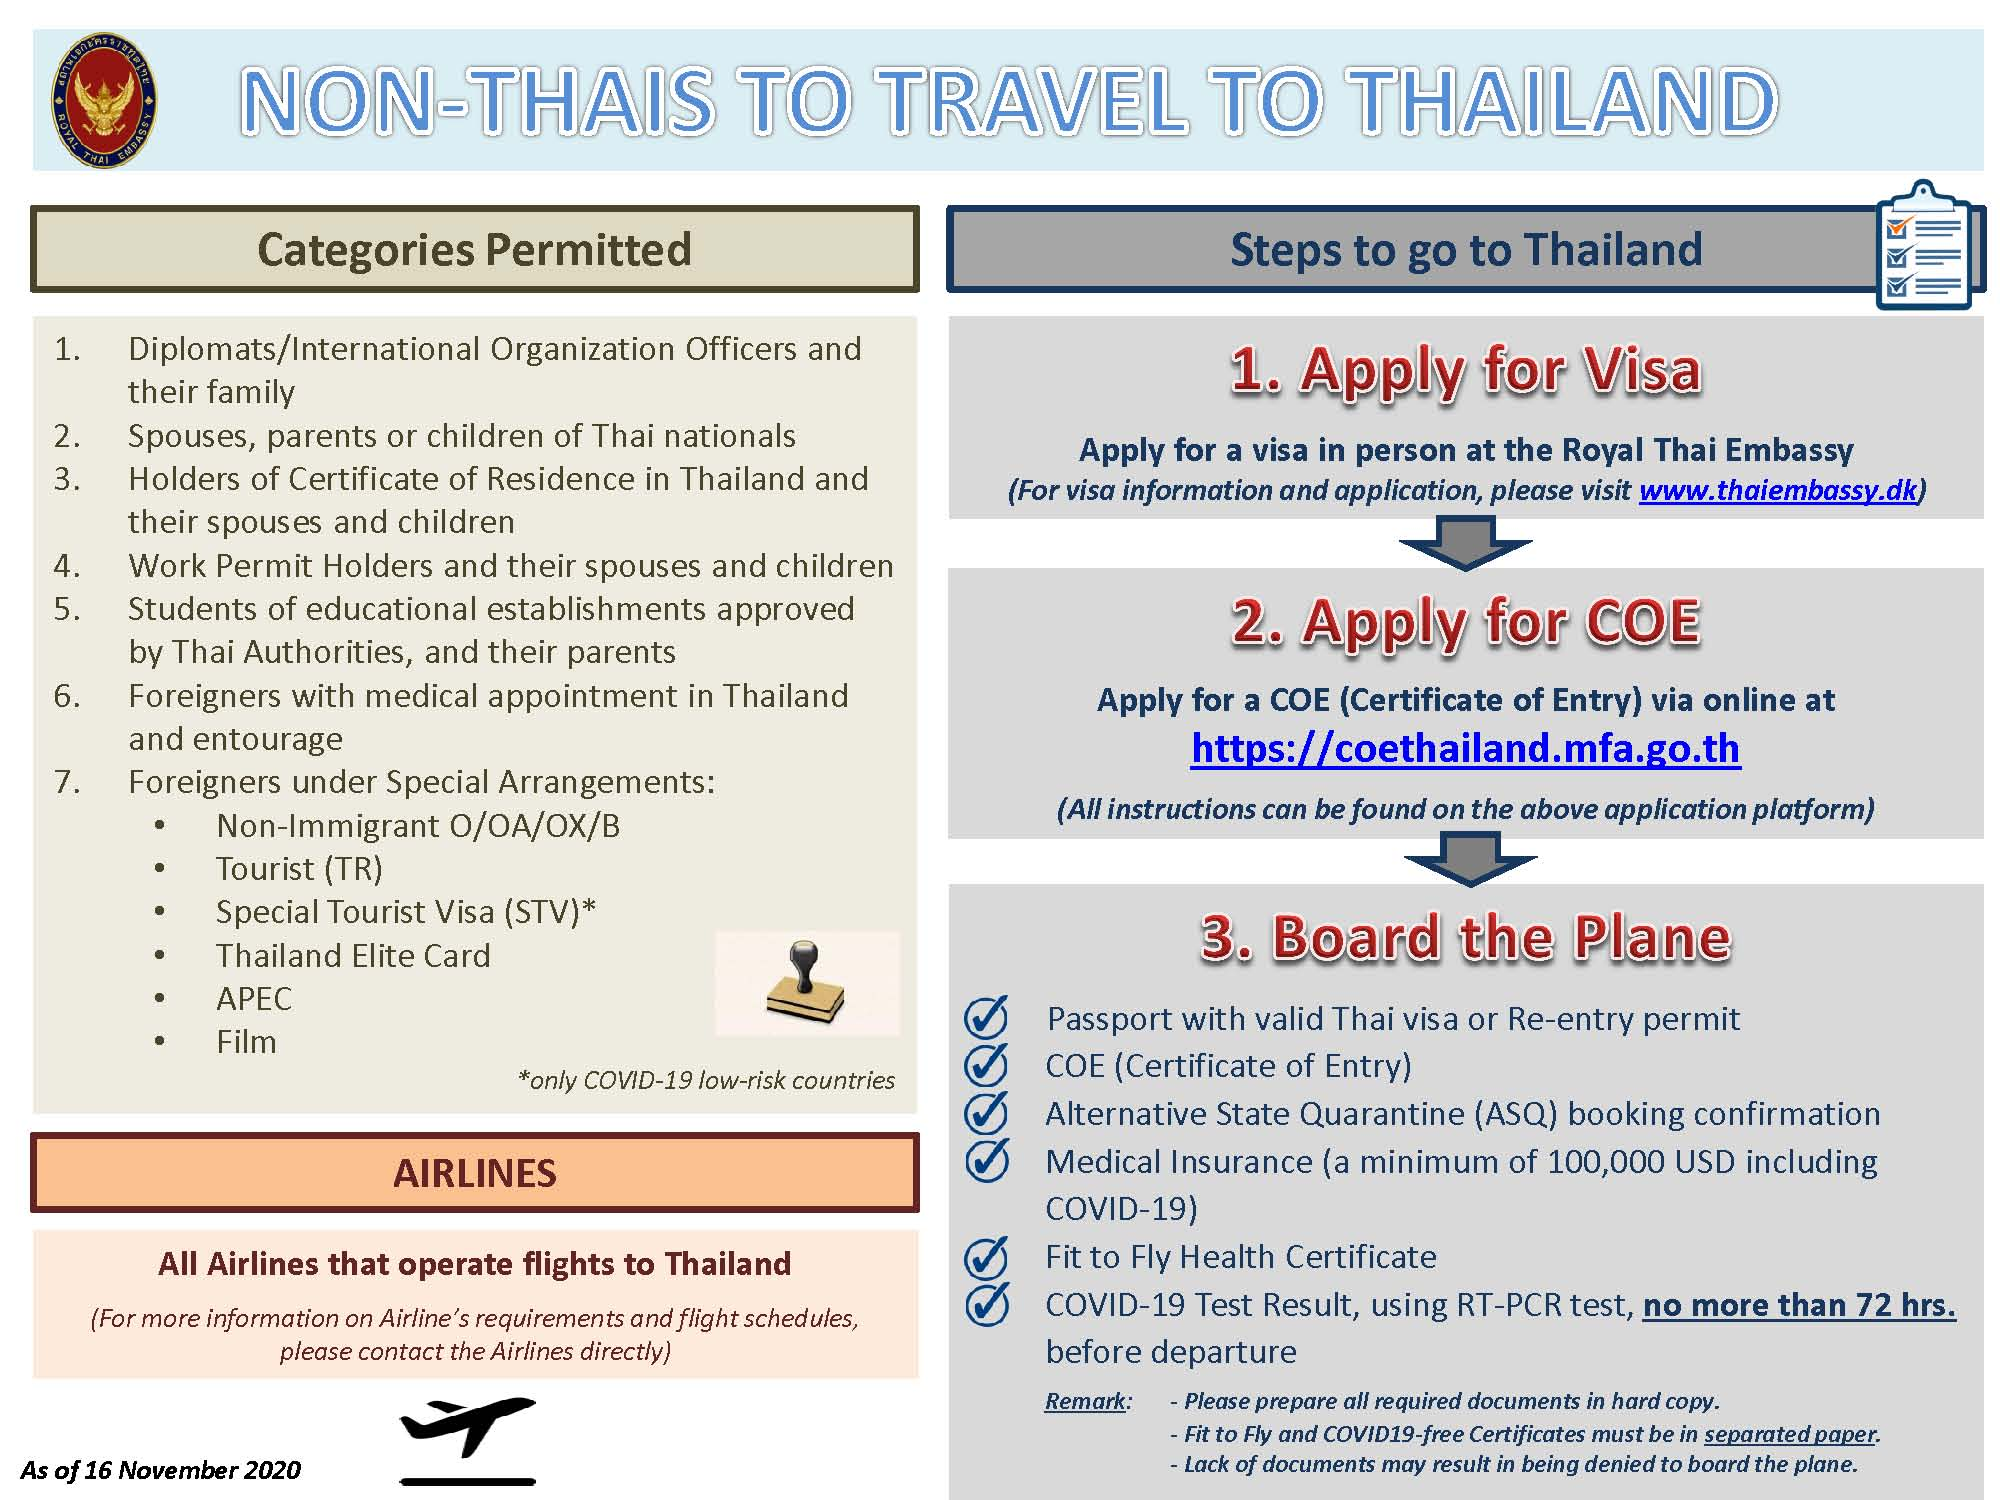 www.thaiguide.dk/forum/forum/attachments/non-thai-travel-to-thailand-16-11-2020.jpg